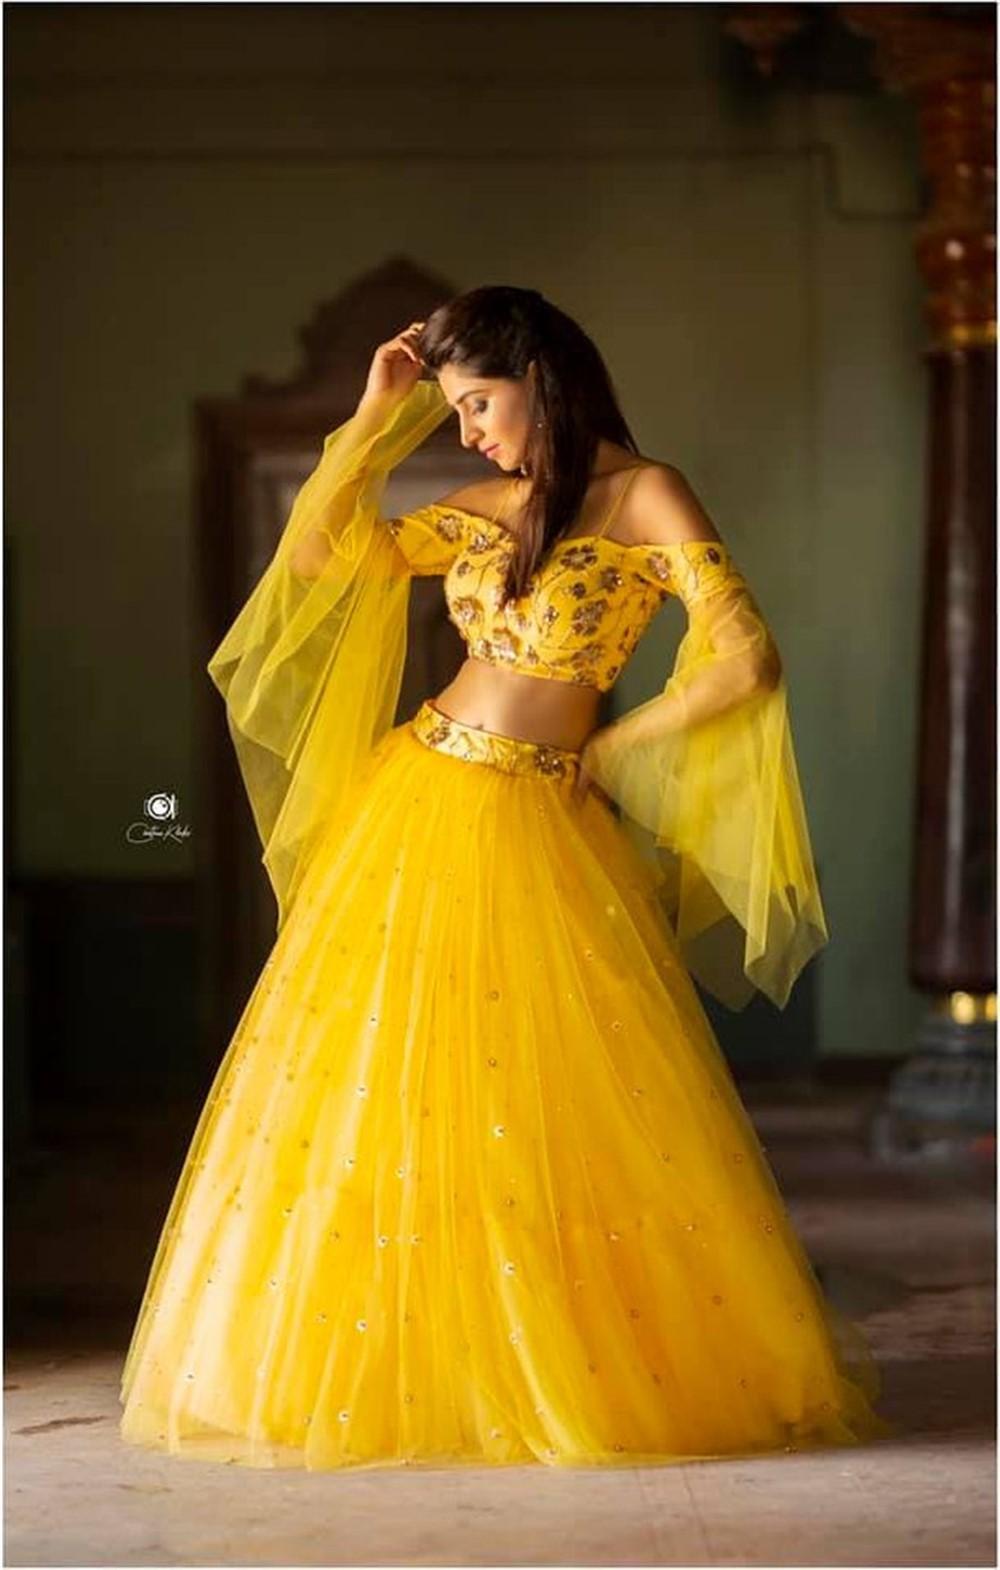 Actress Shamili Sounderajan Photoshoot Pictures